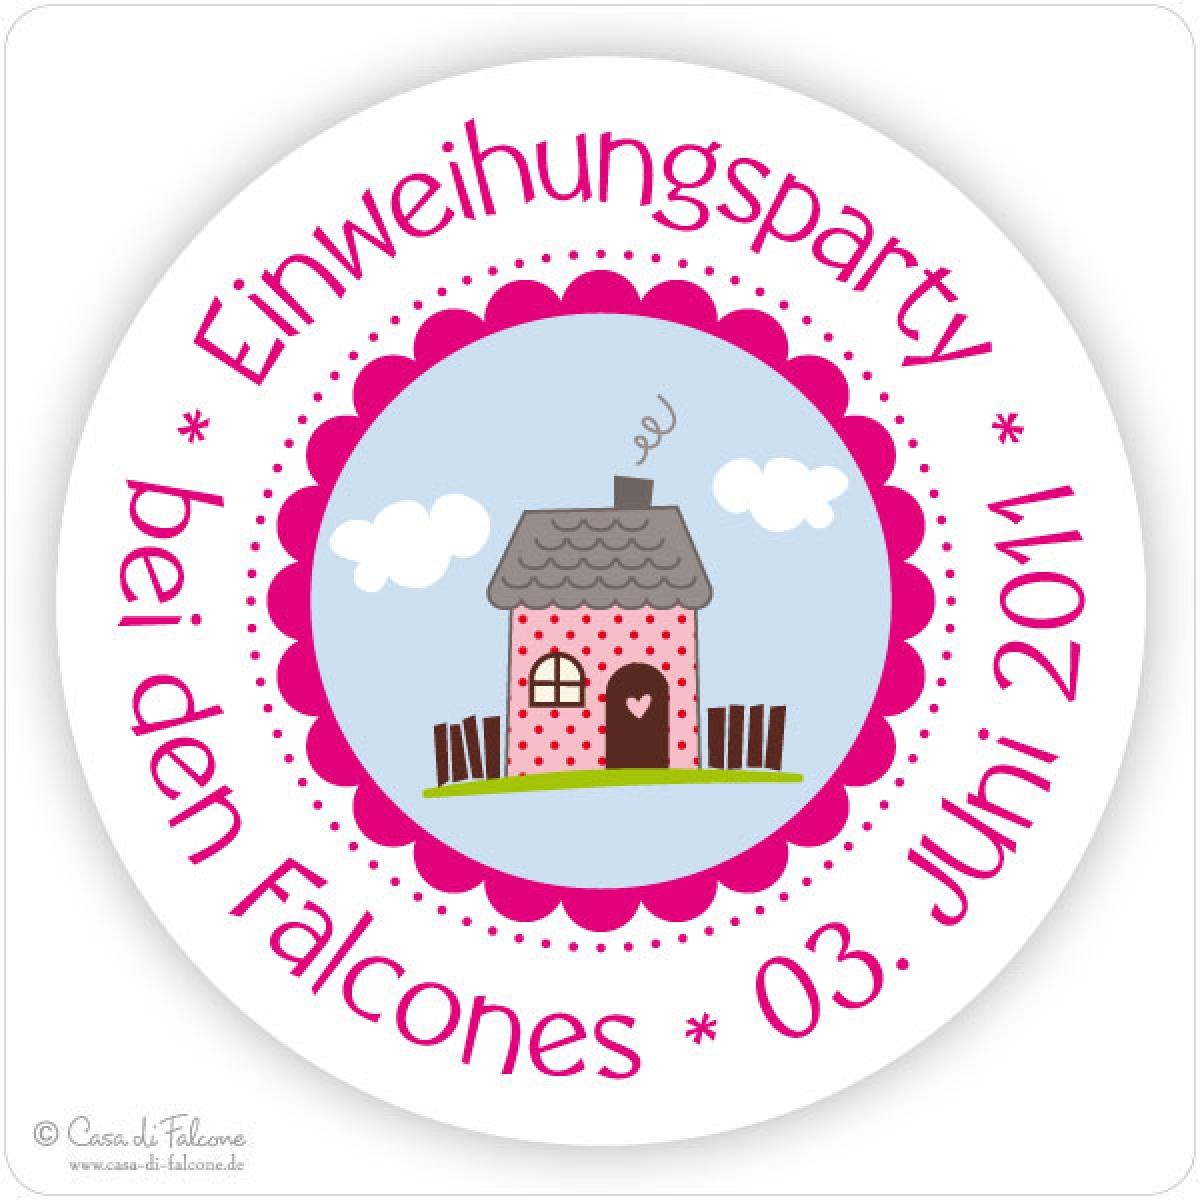 Aufkleber einweihungsparty casa di falcone - Einweihungsparty auf englisch ...